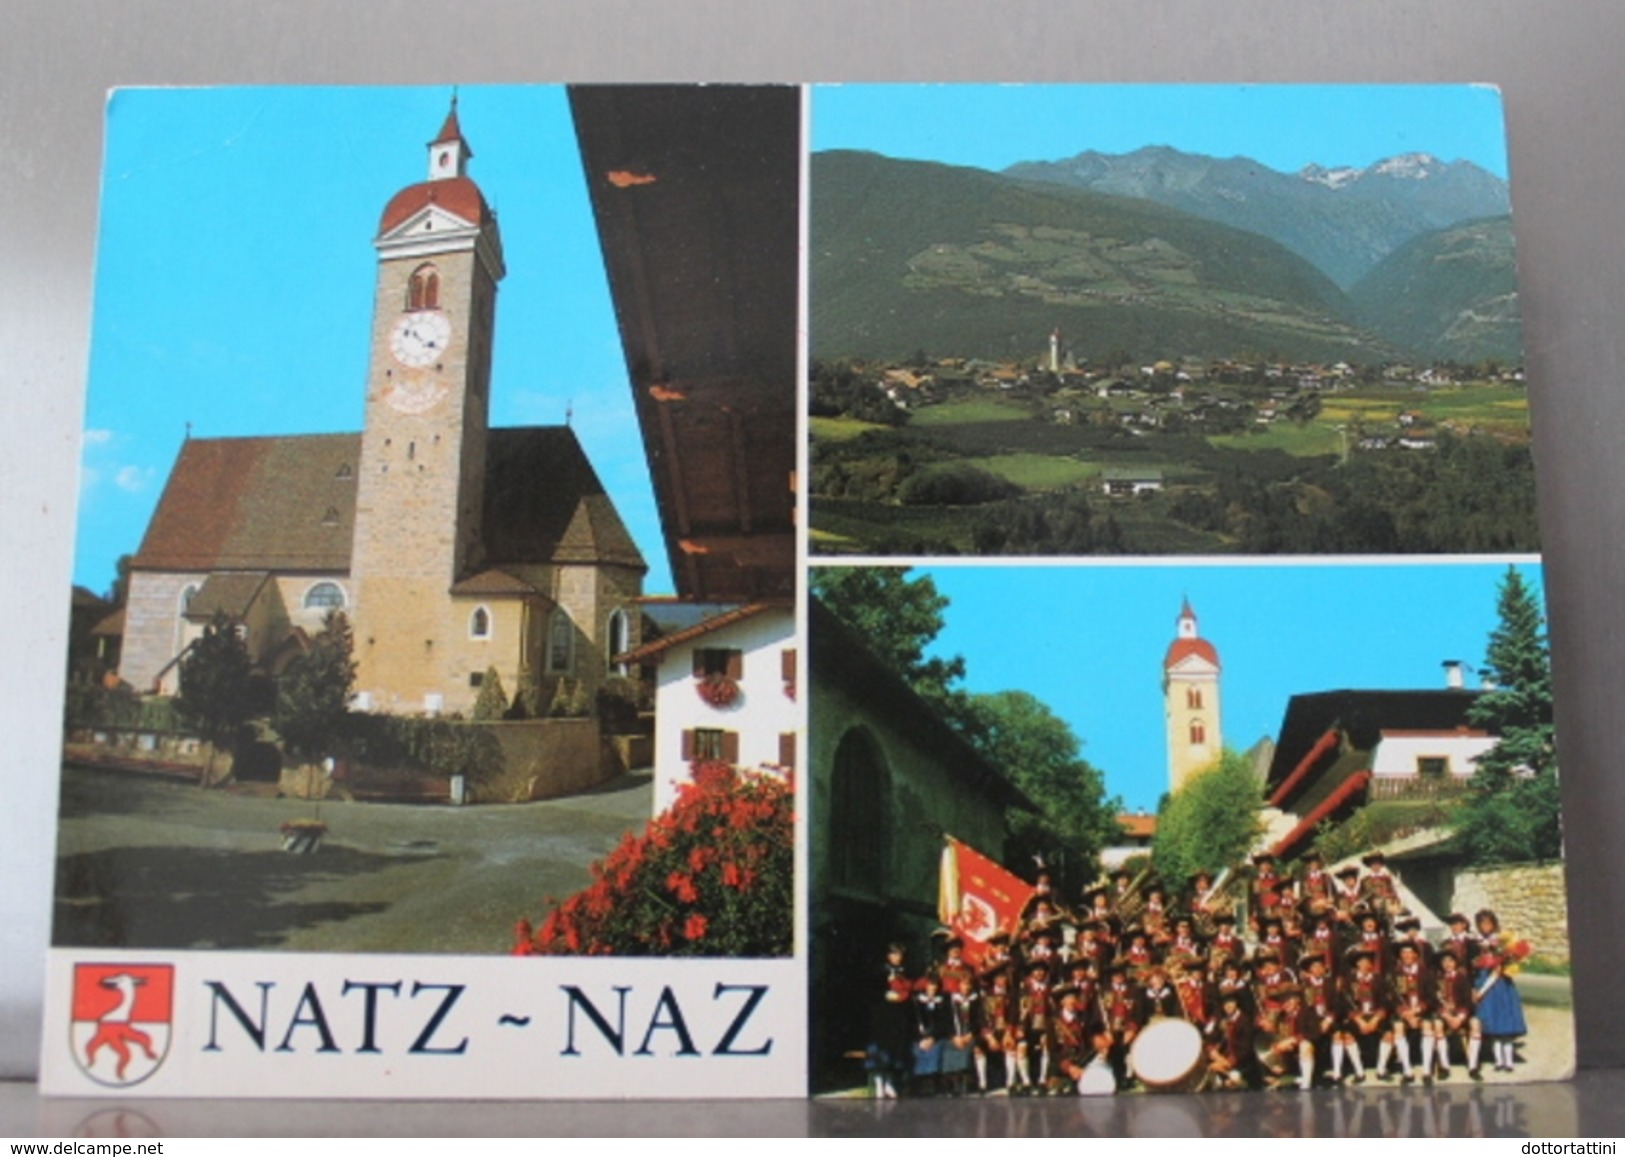 NAZ - NATZ (Bressanone - Bolzano) Valle D'Isarco Eisacktal Multiview - Bolzano